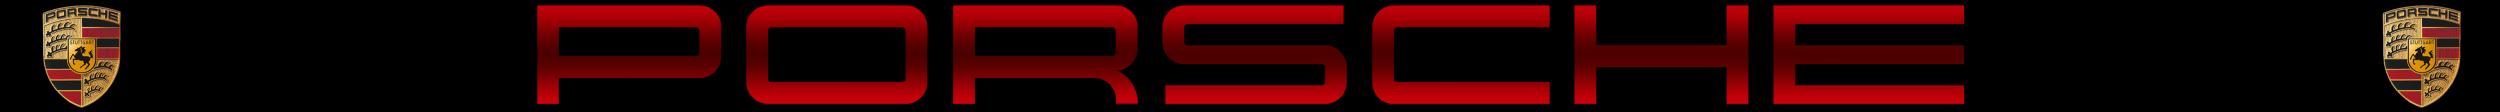 flaga_niemcy_ramka[1].png